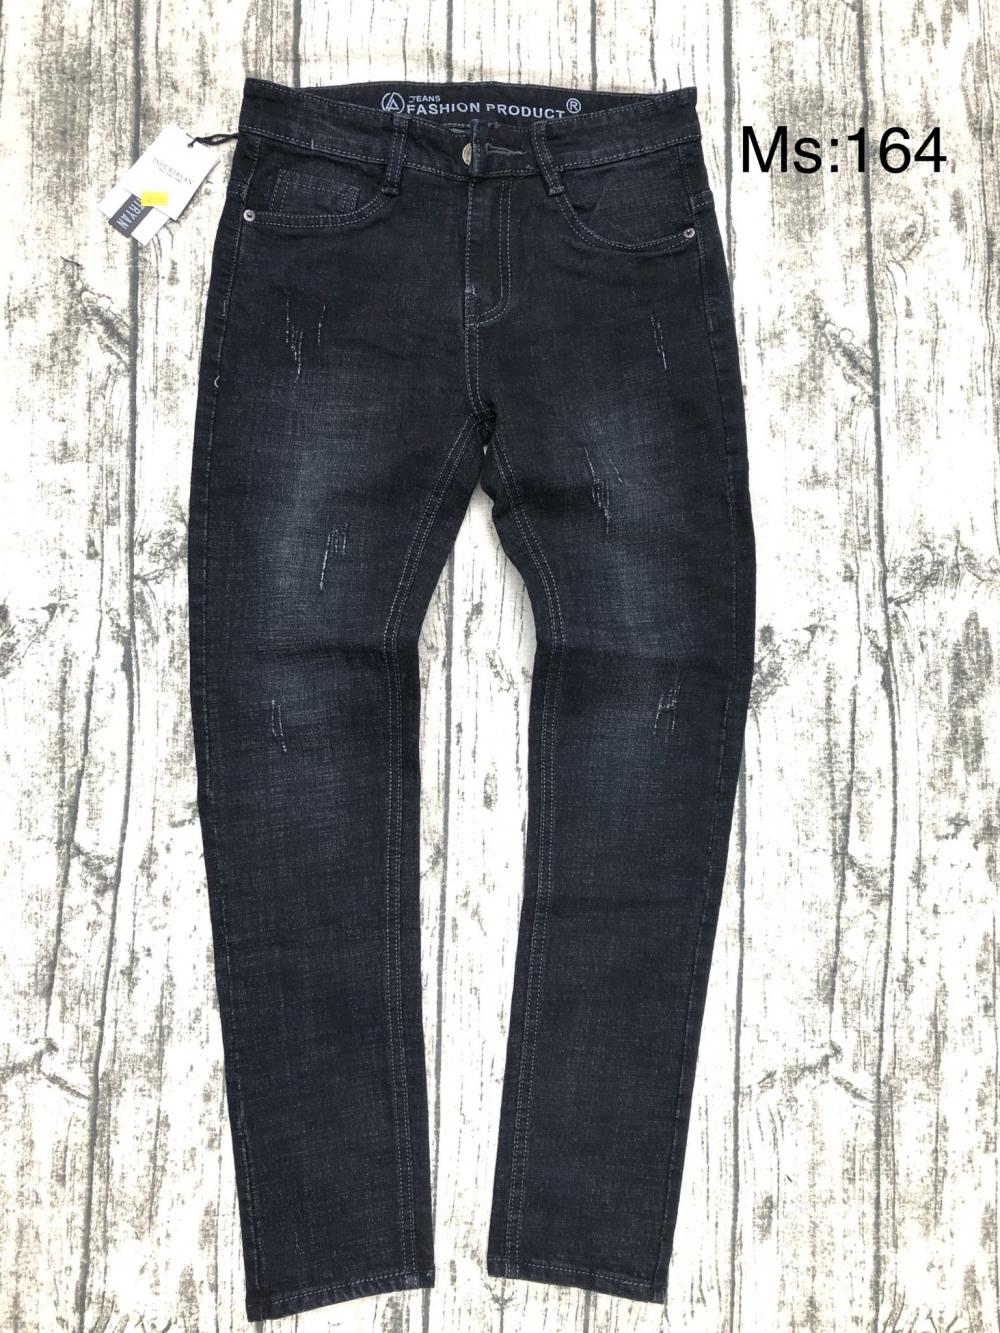 Quần jean nam dài MS164